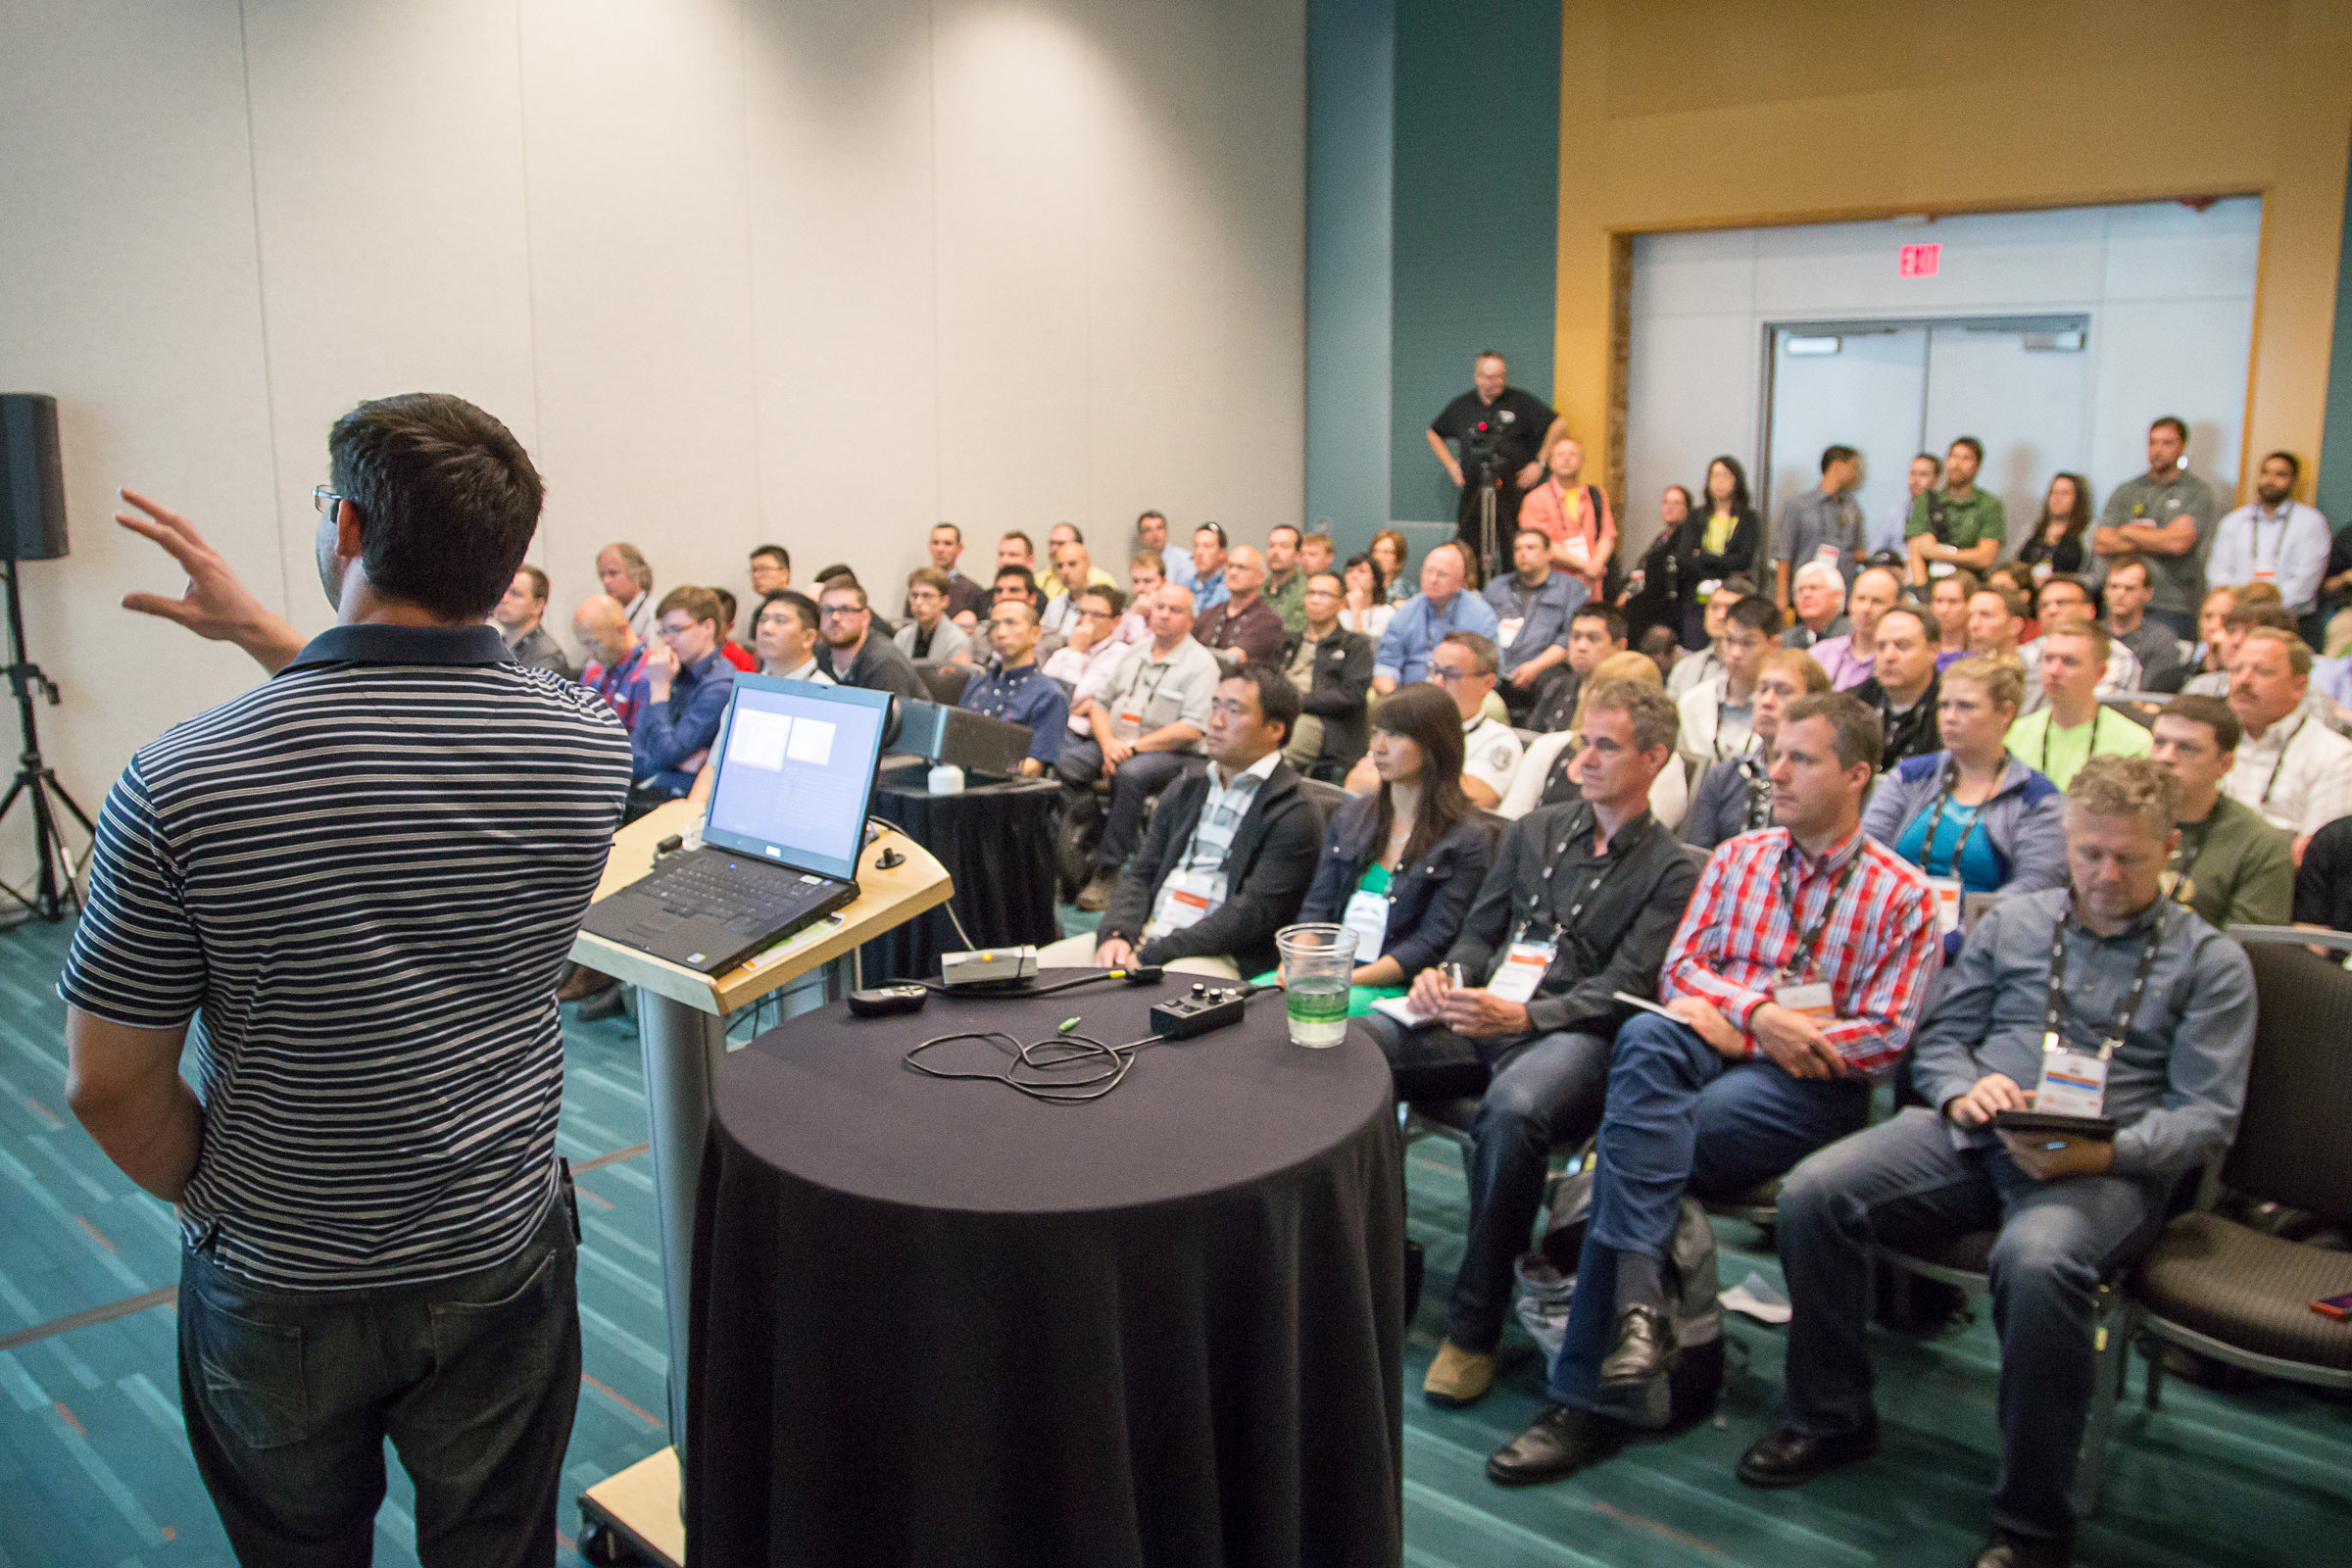 FME User Presentations